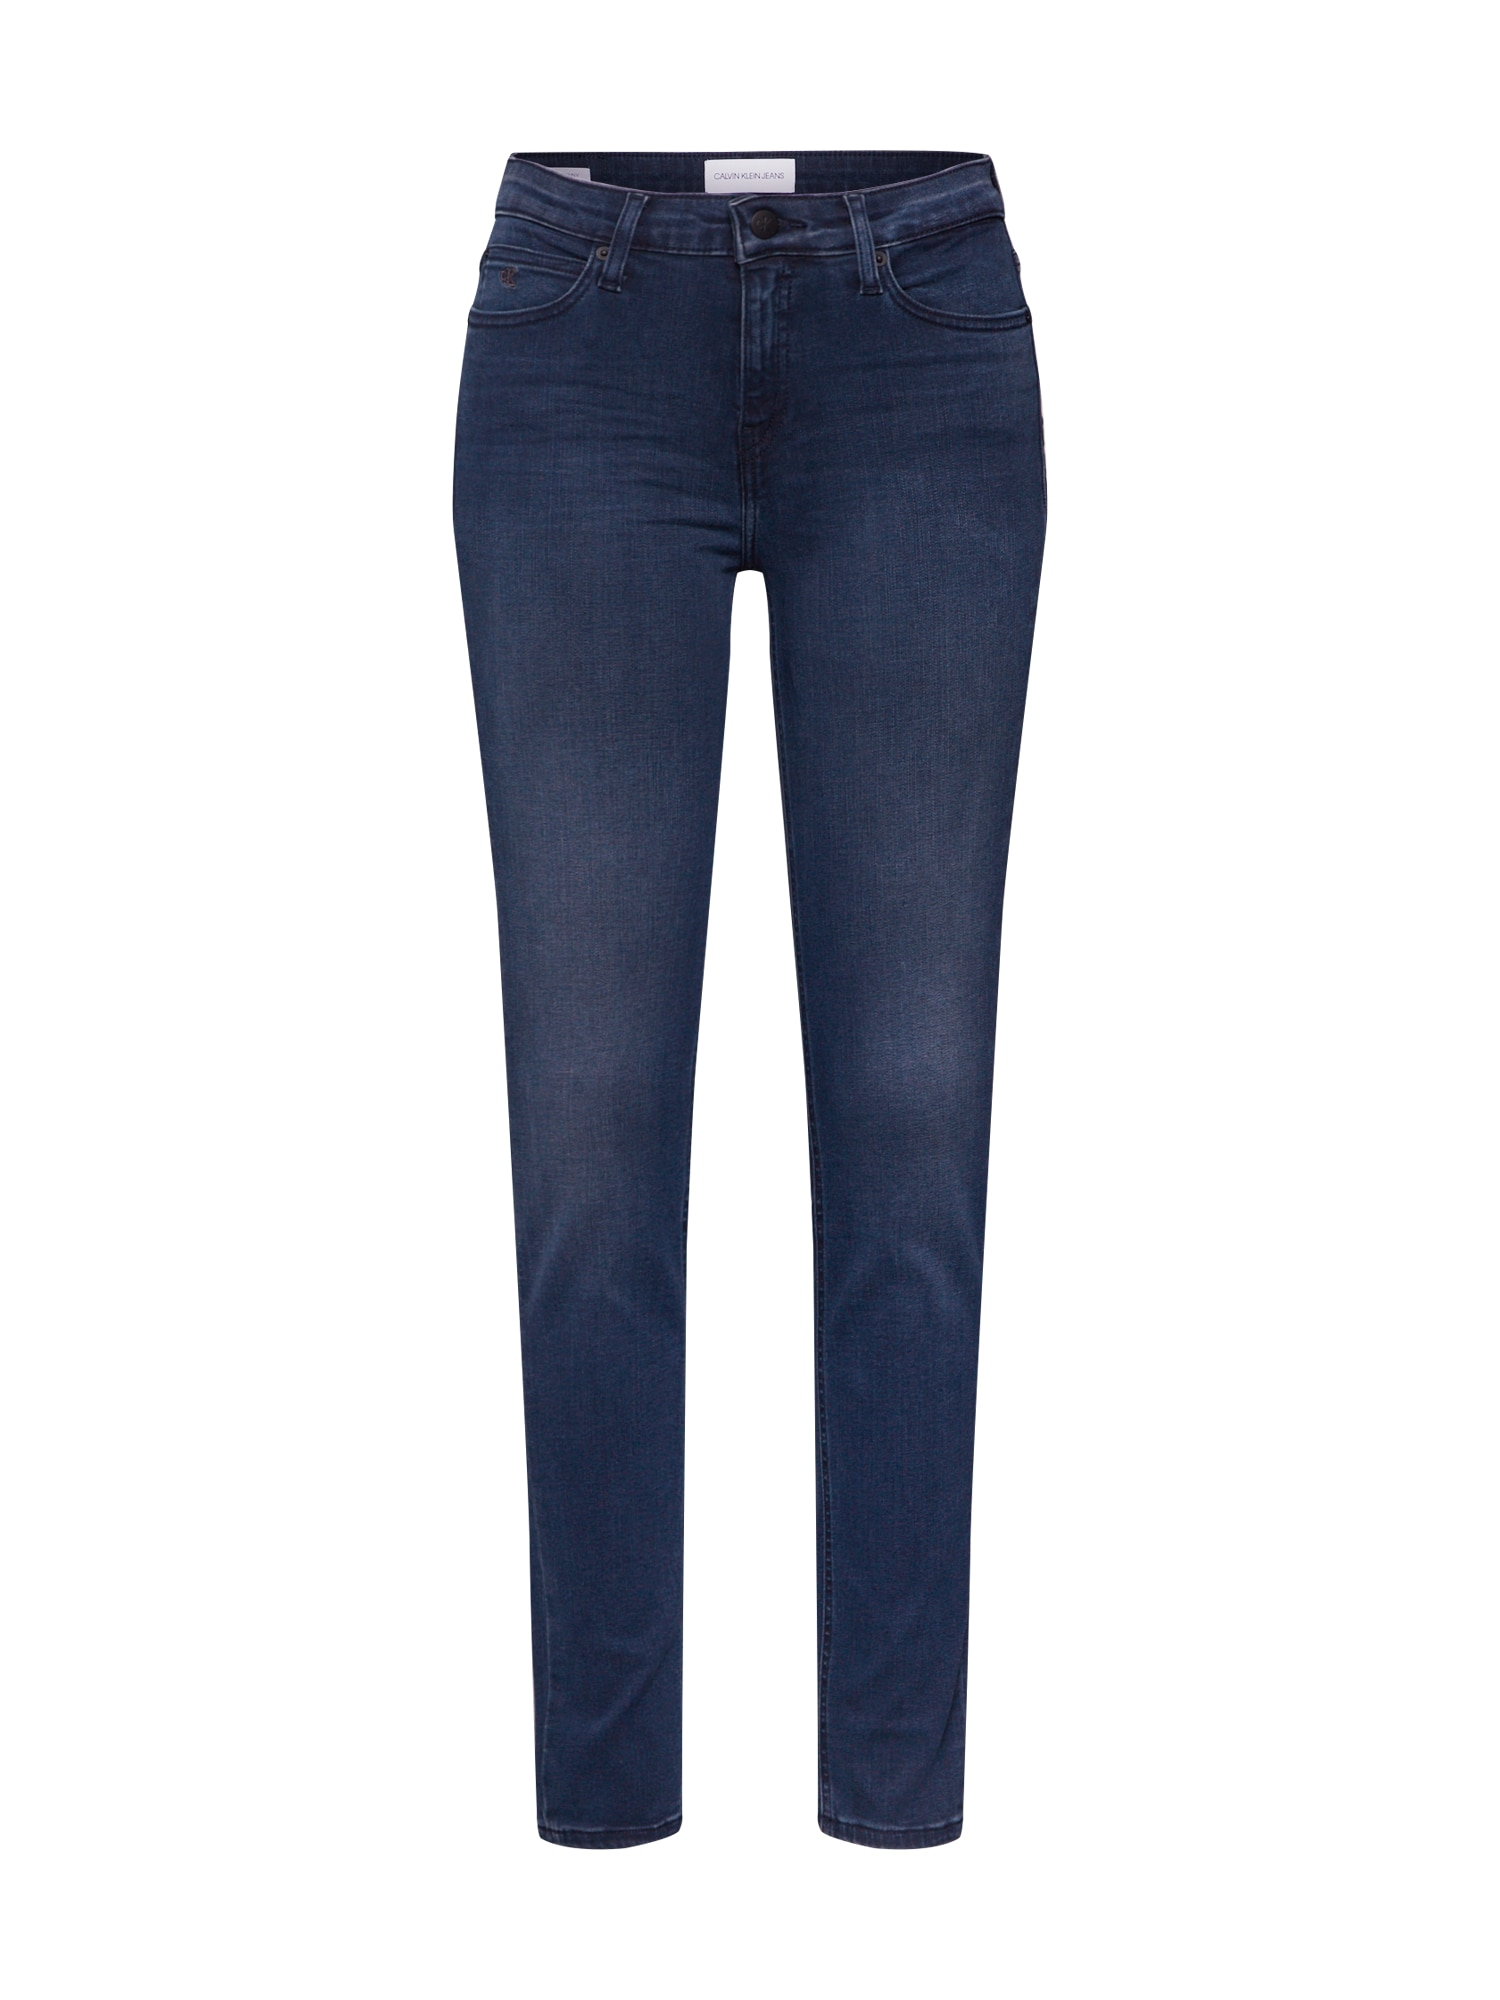 Calvin Klein Džinsai 'CKJ 011 MID RISE SKINNY' tamsiai (džinso) mėlyna